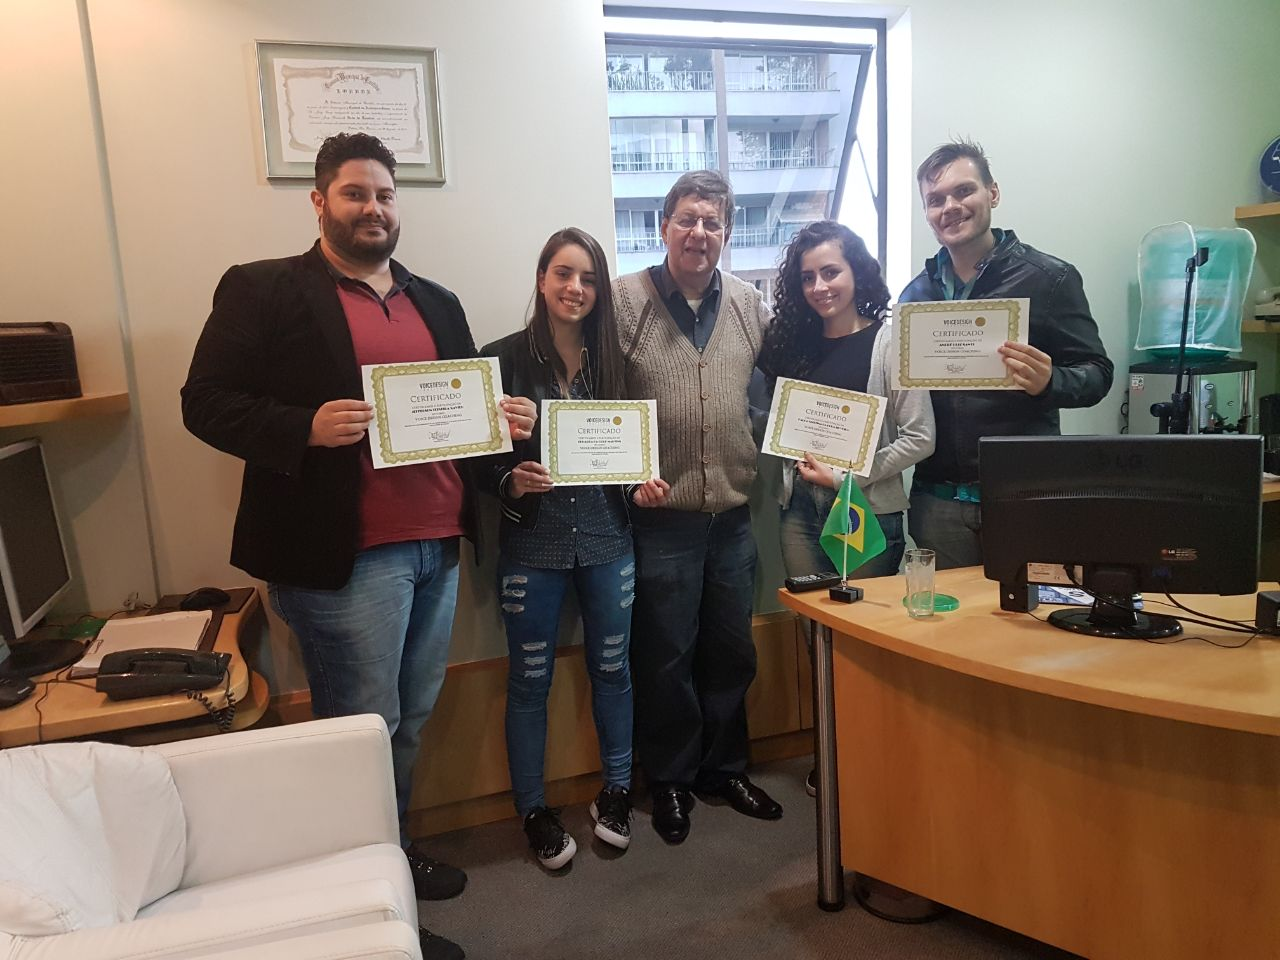 Jefferson Xavier, Eduarda Martins, Jorge Cury Neto, Karla Cristina Silveira e André Santi